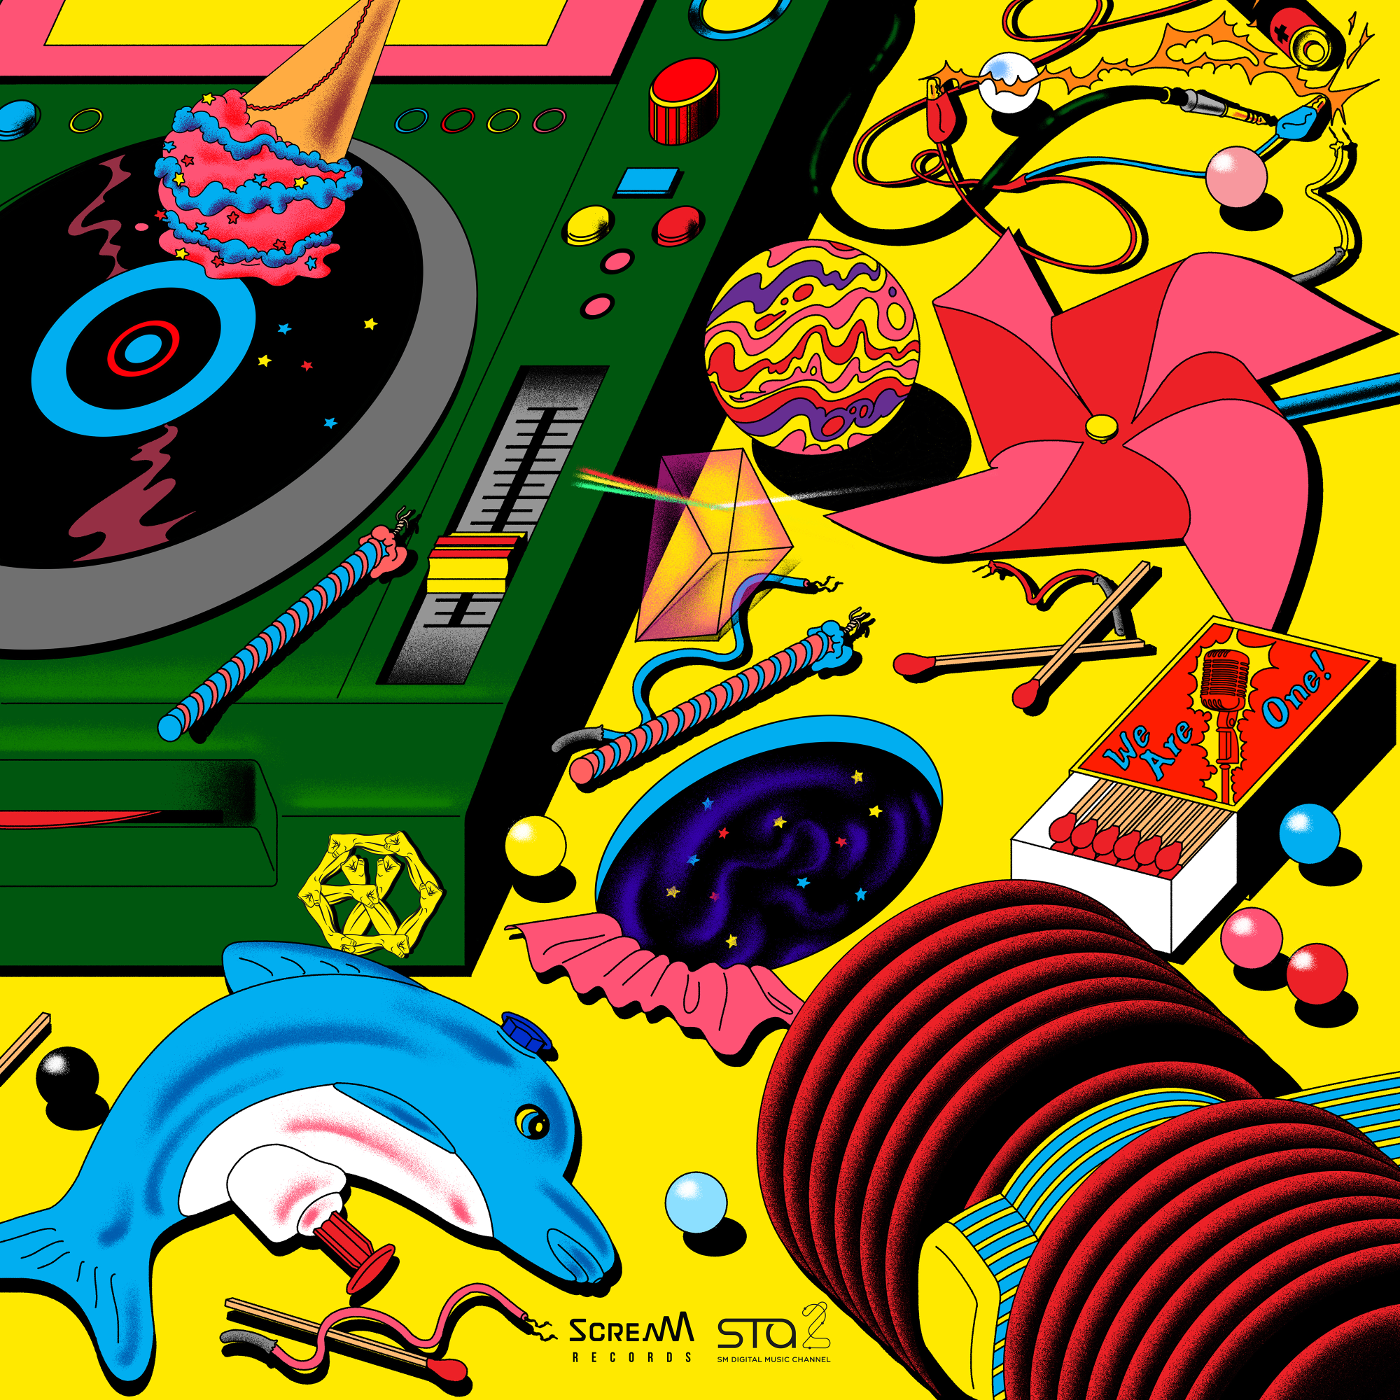 EXO Power (Remixes) cover art.png